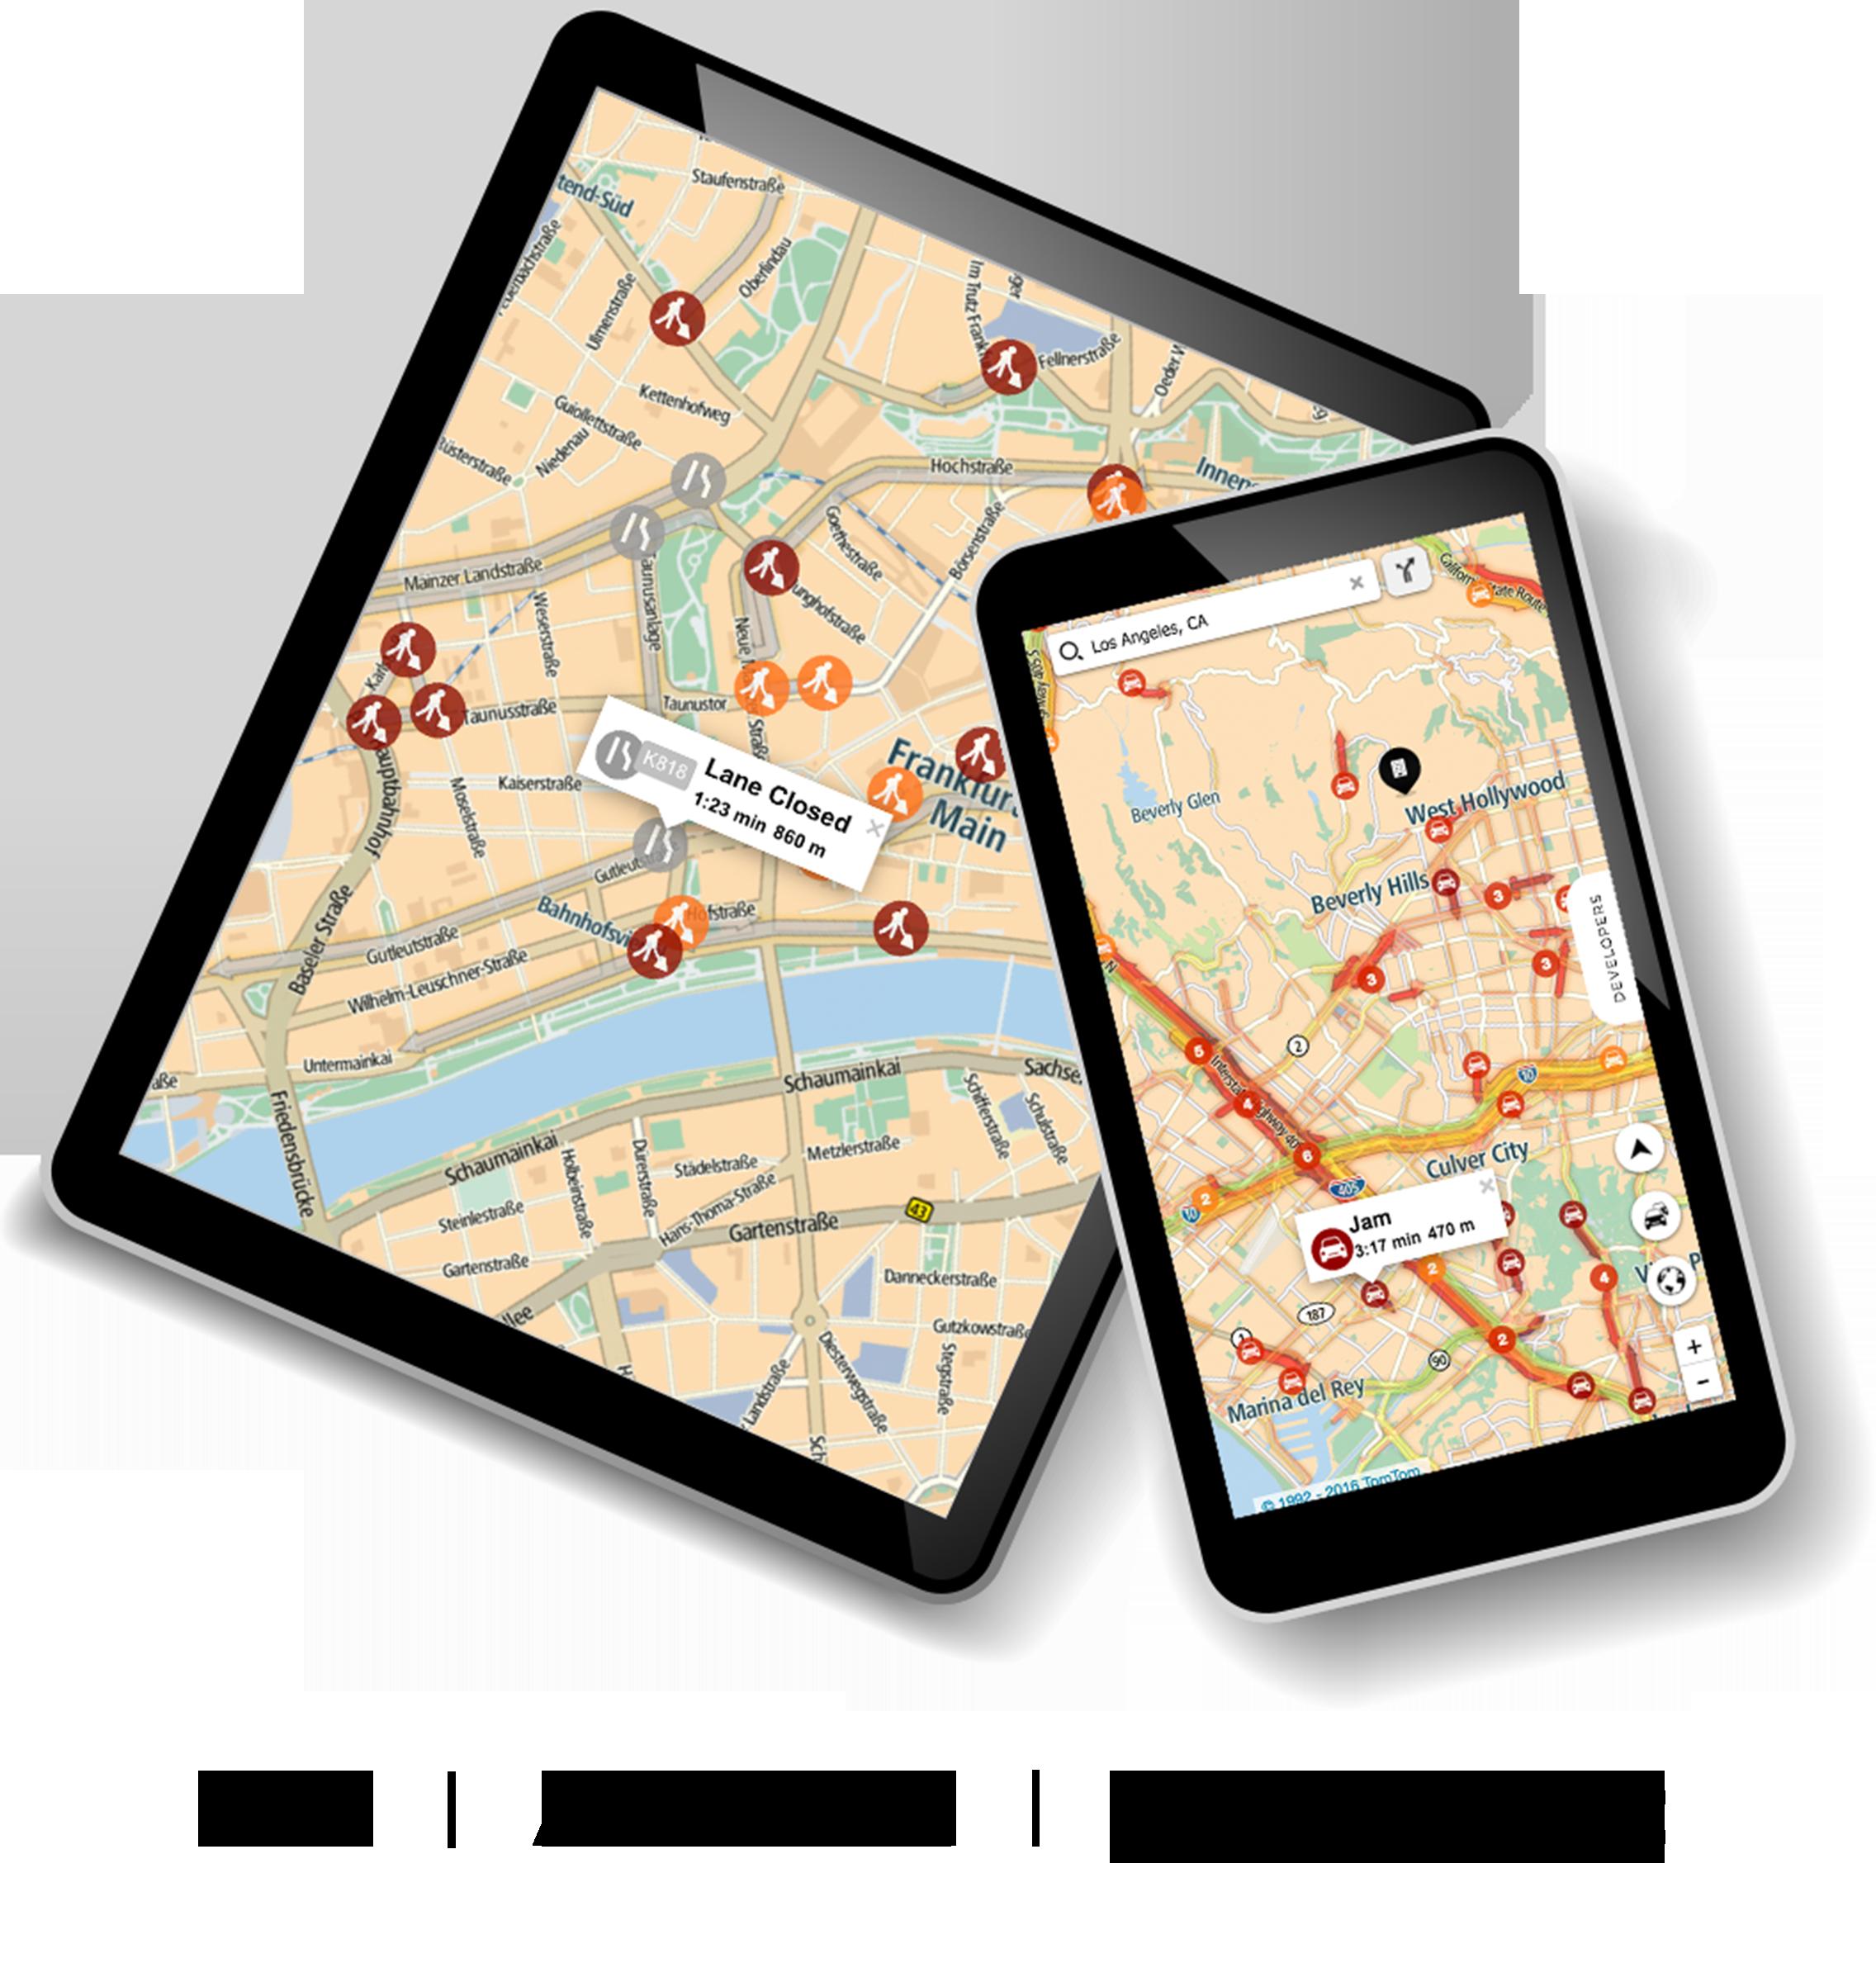 TomTom Maps | Maps APIs